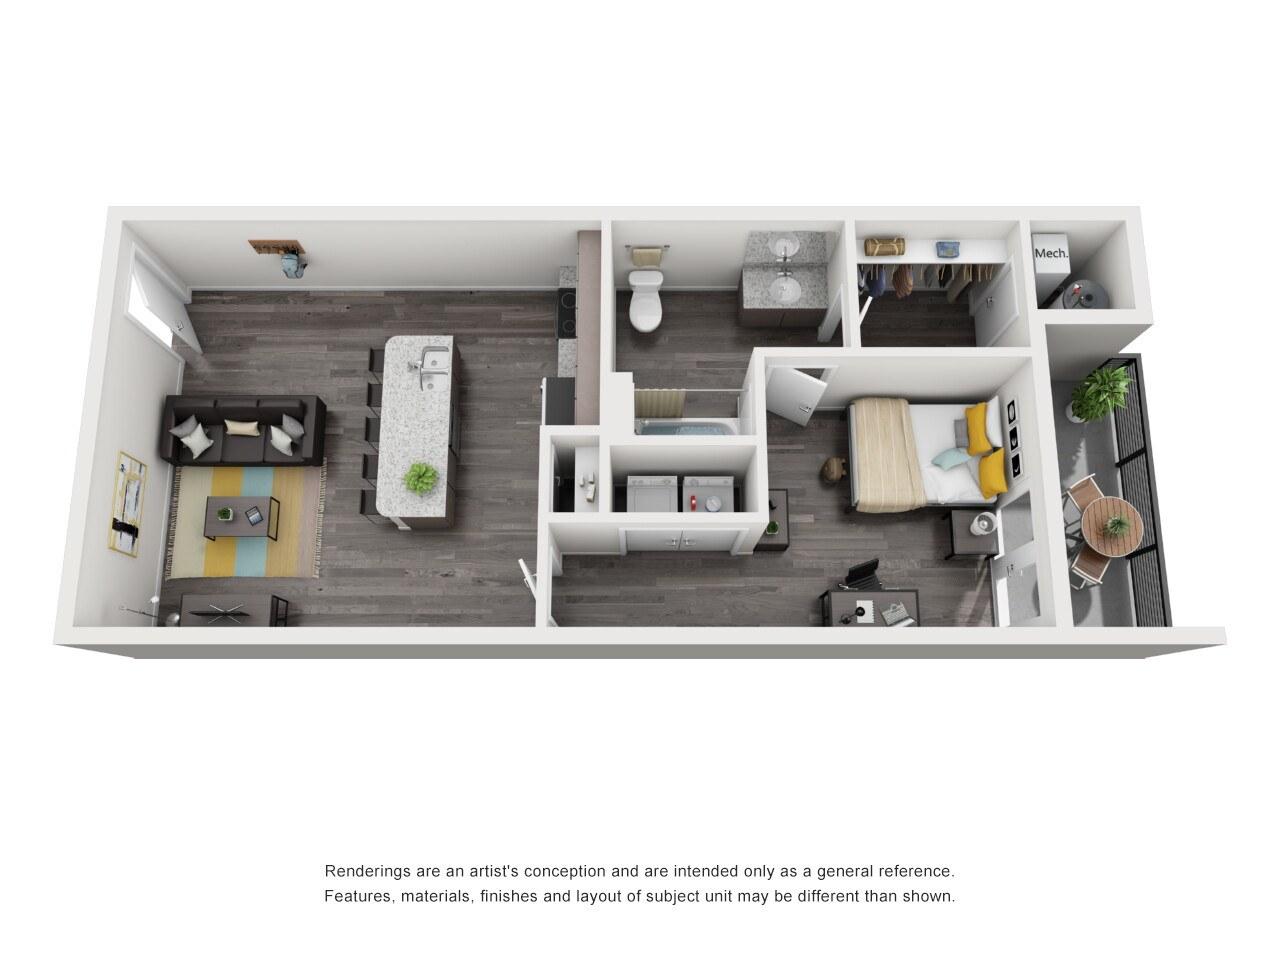 luxury student housing in Tuscaloosa AL